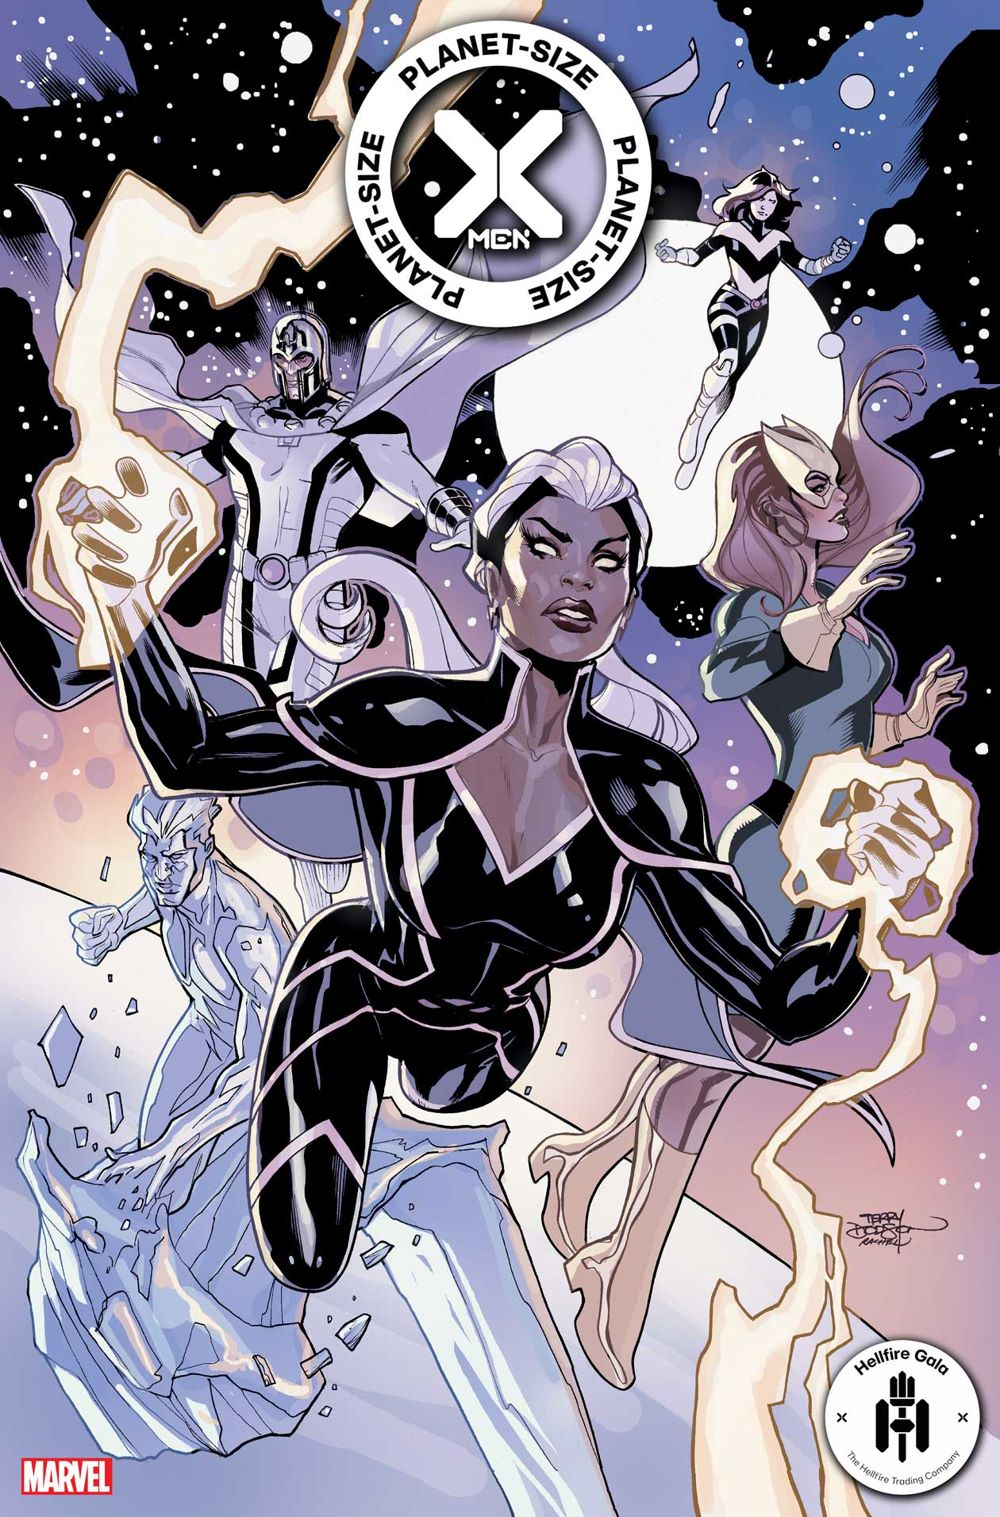 PSXMEN2021001_Dodson-var First Look at PLANET-SIZE X-MEN #1 from Marvel Comics